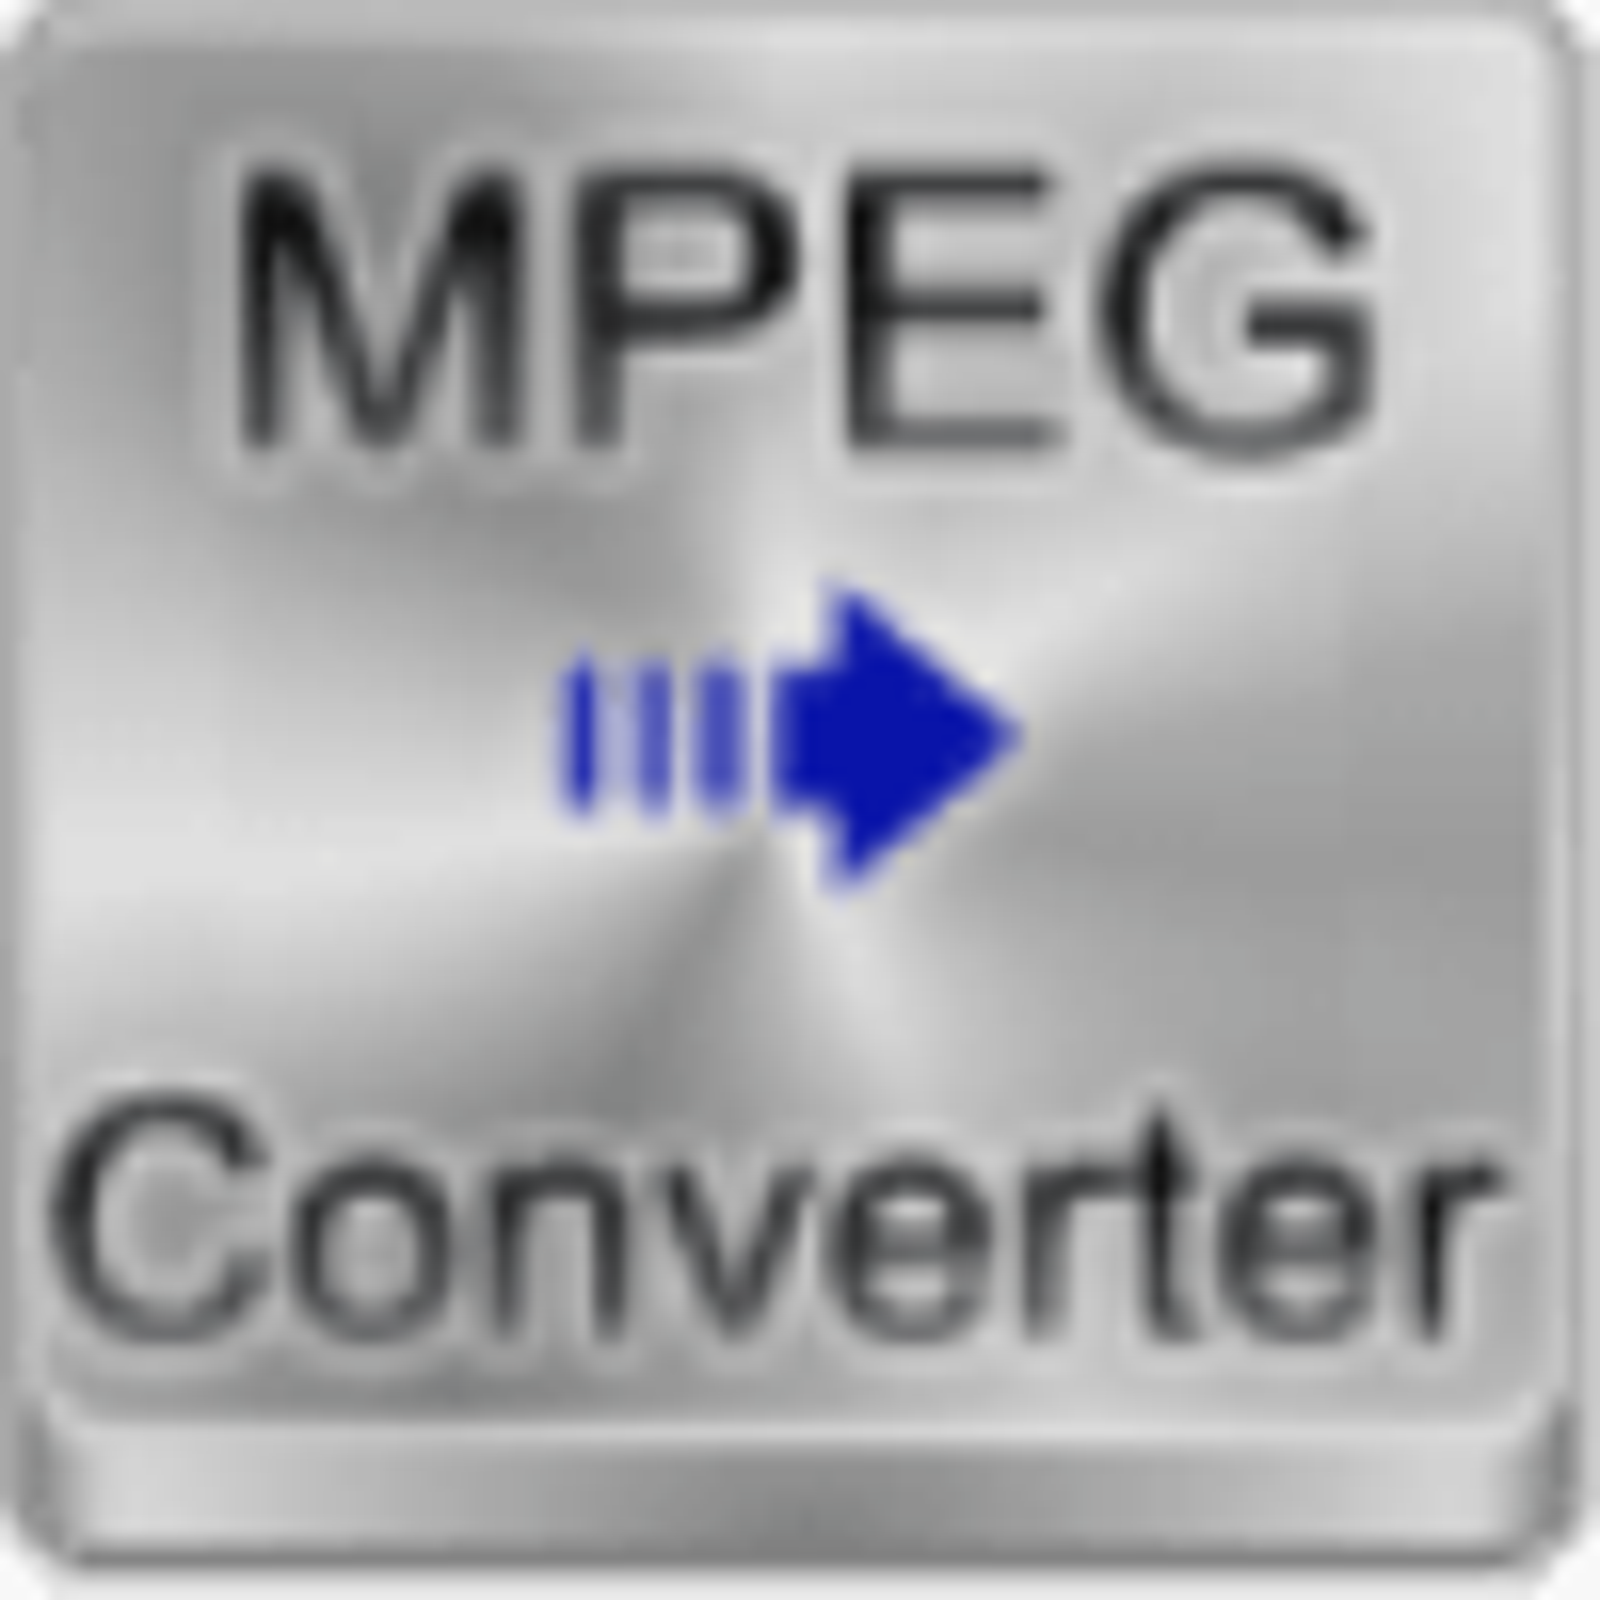 Free MPEG Converter